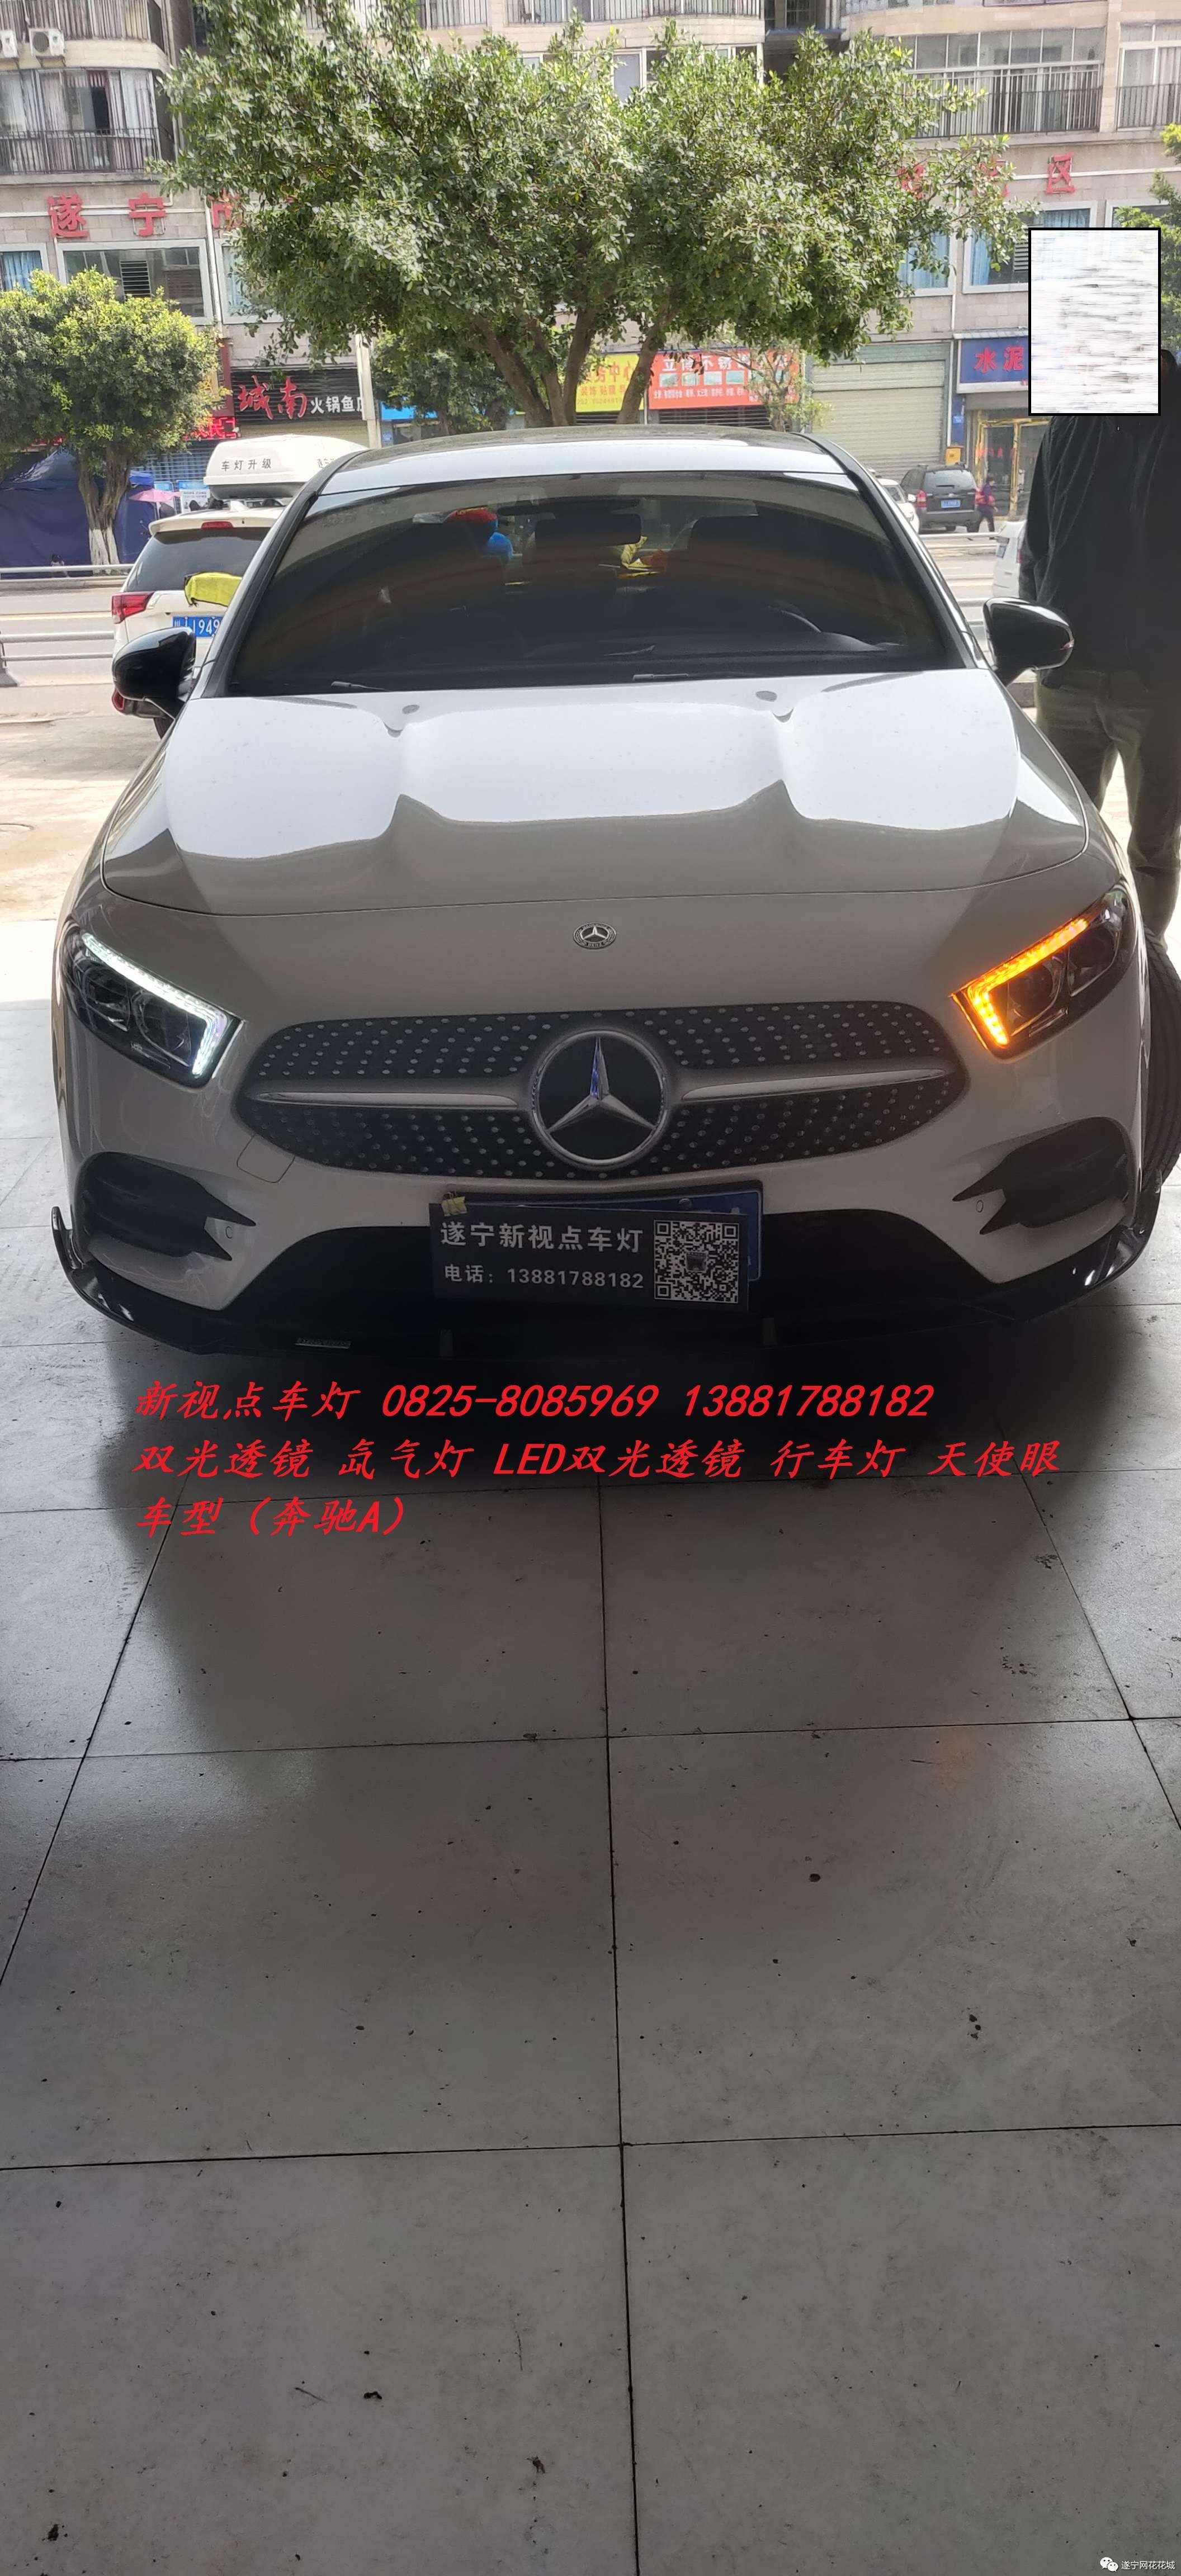 IMG_20200407_104951.jpg